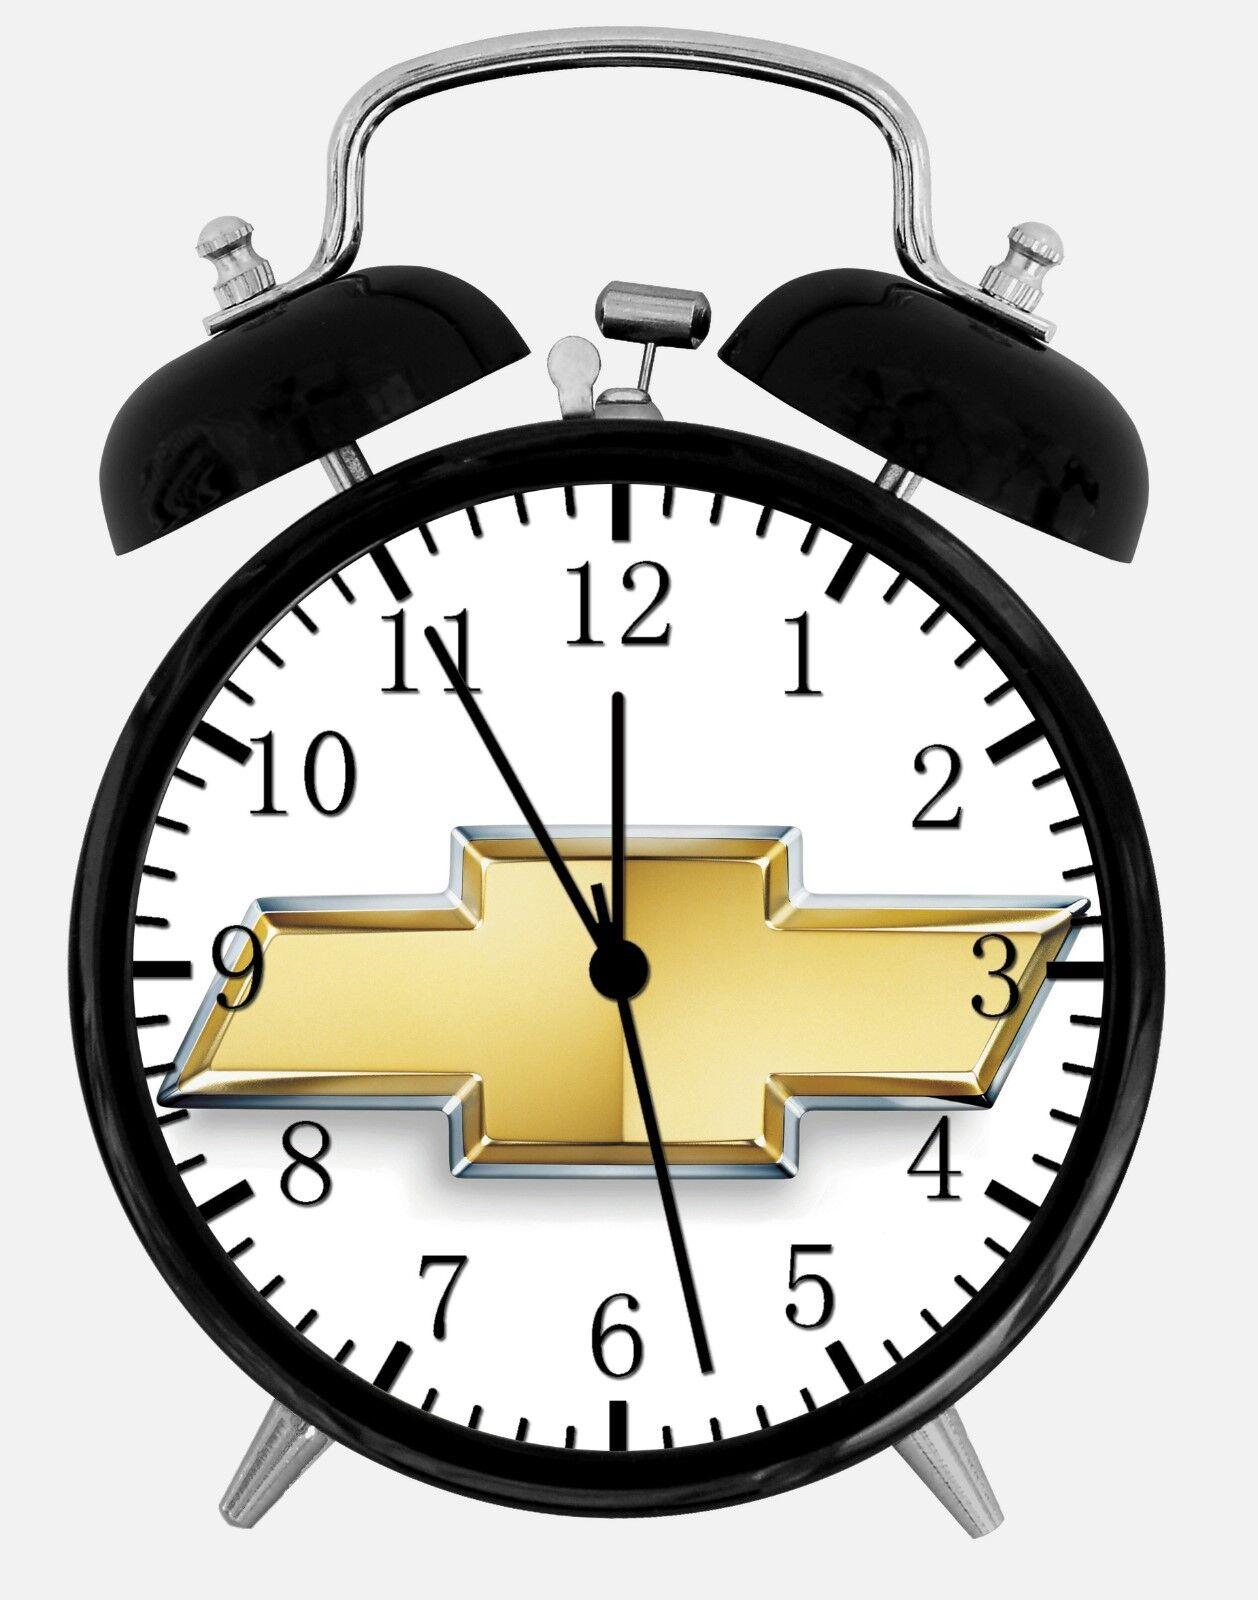 "Chevrolet Alarm Desk Clock 3.75"" Home or Office Decor W437 Nice For Gift"